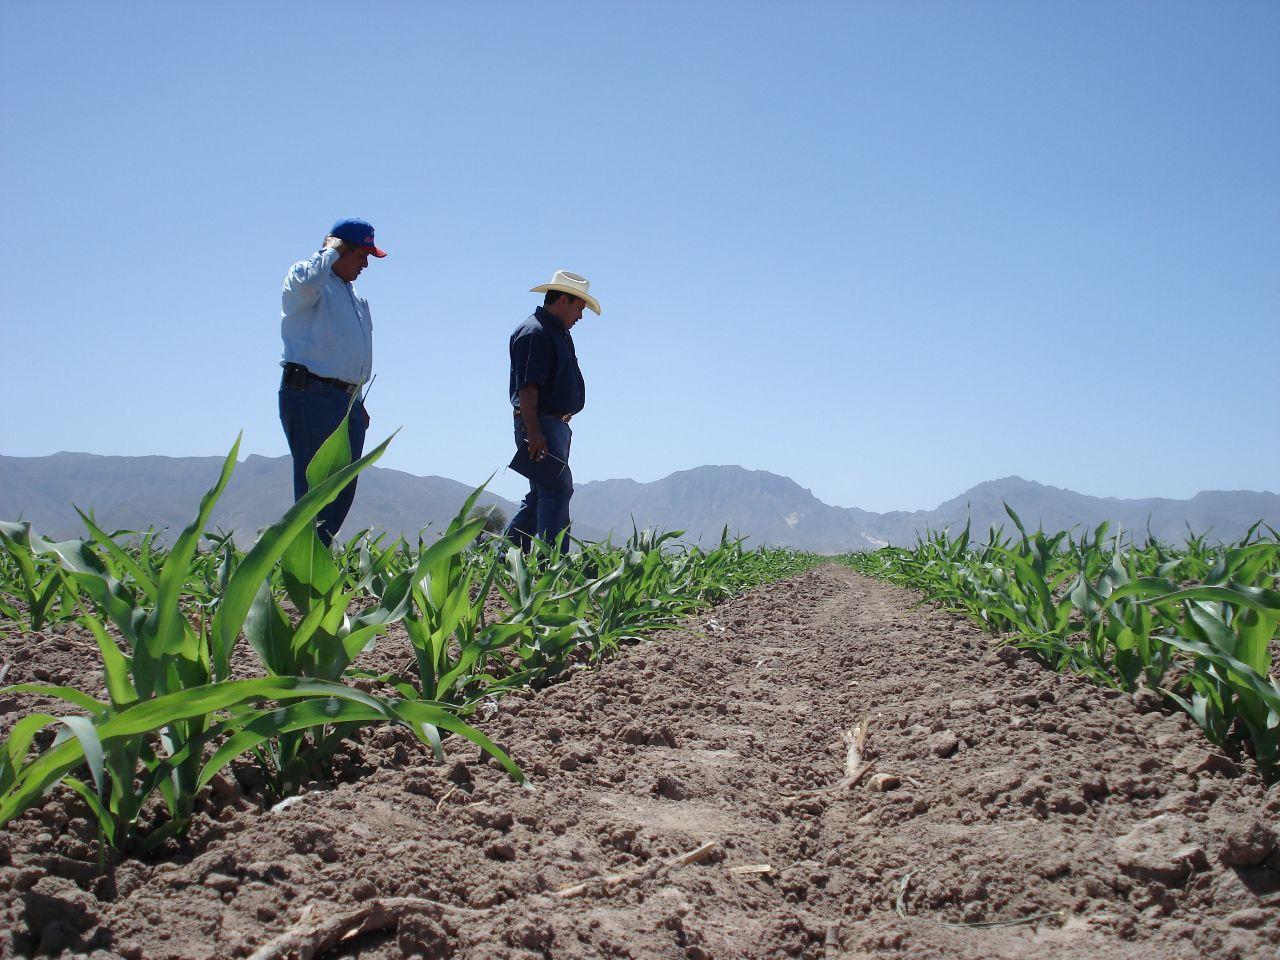 Campaña agrícola en Lambayeque presenta retraso por ausencia de lluvias